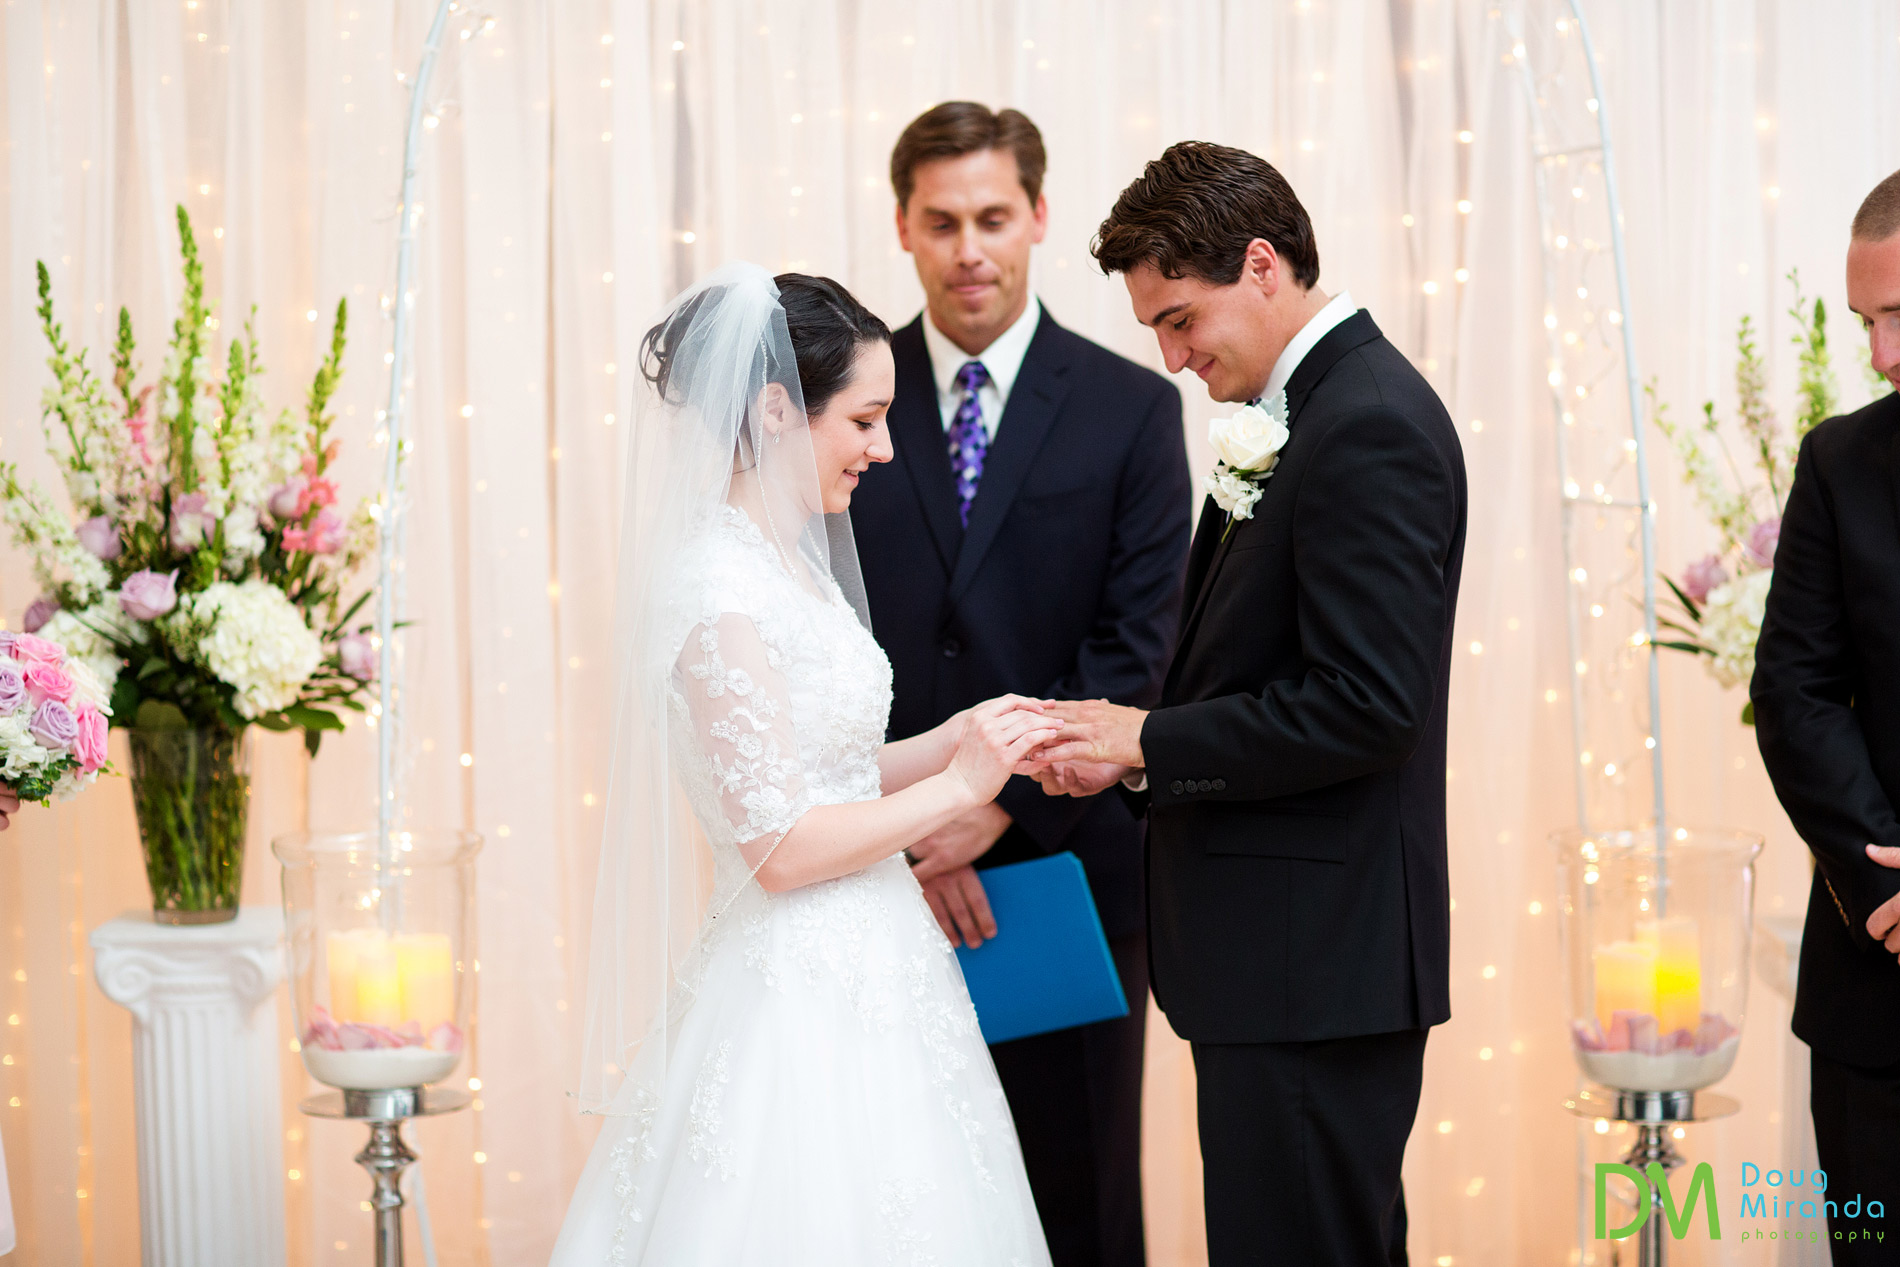 oakland lds temple wedding photos